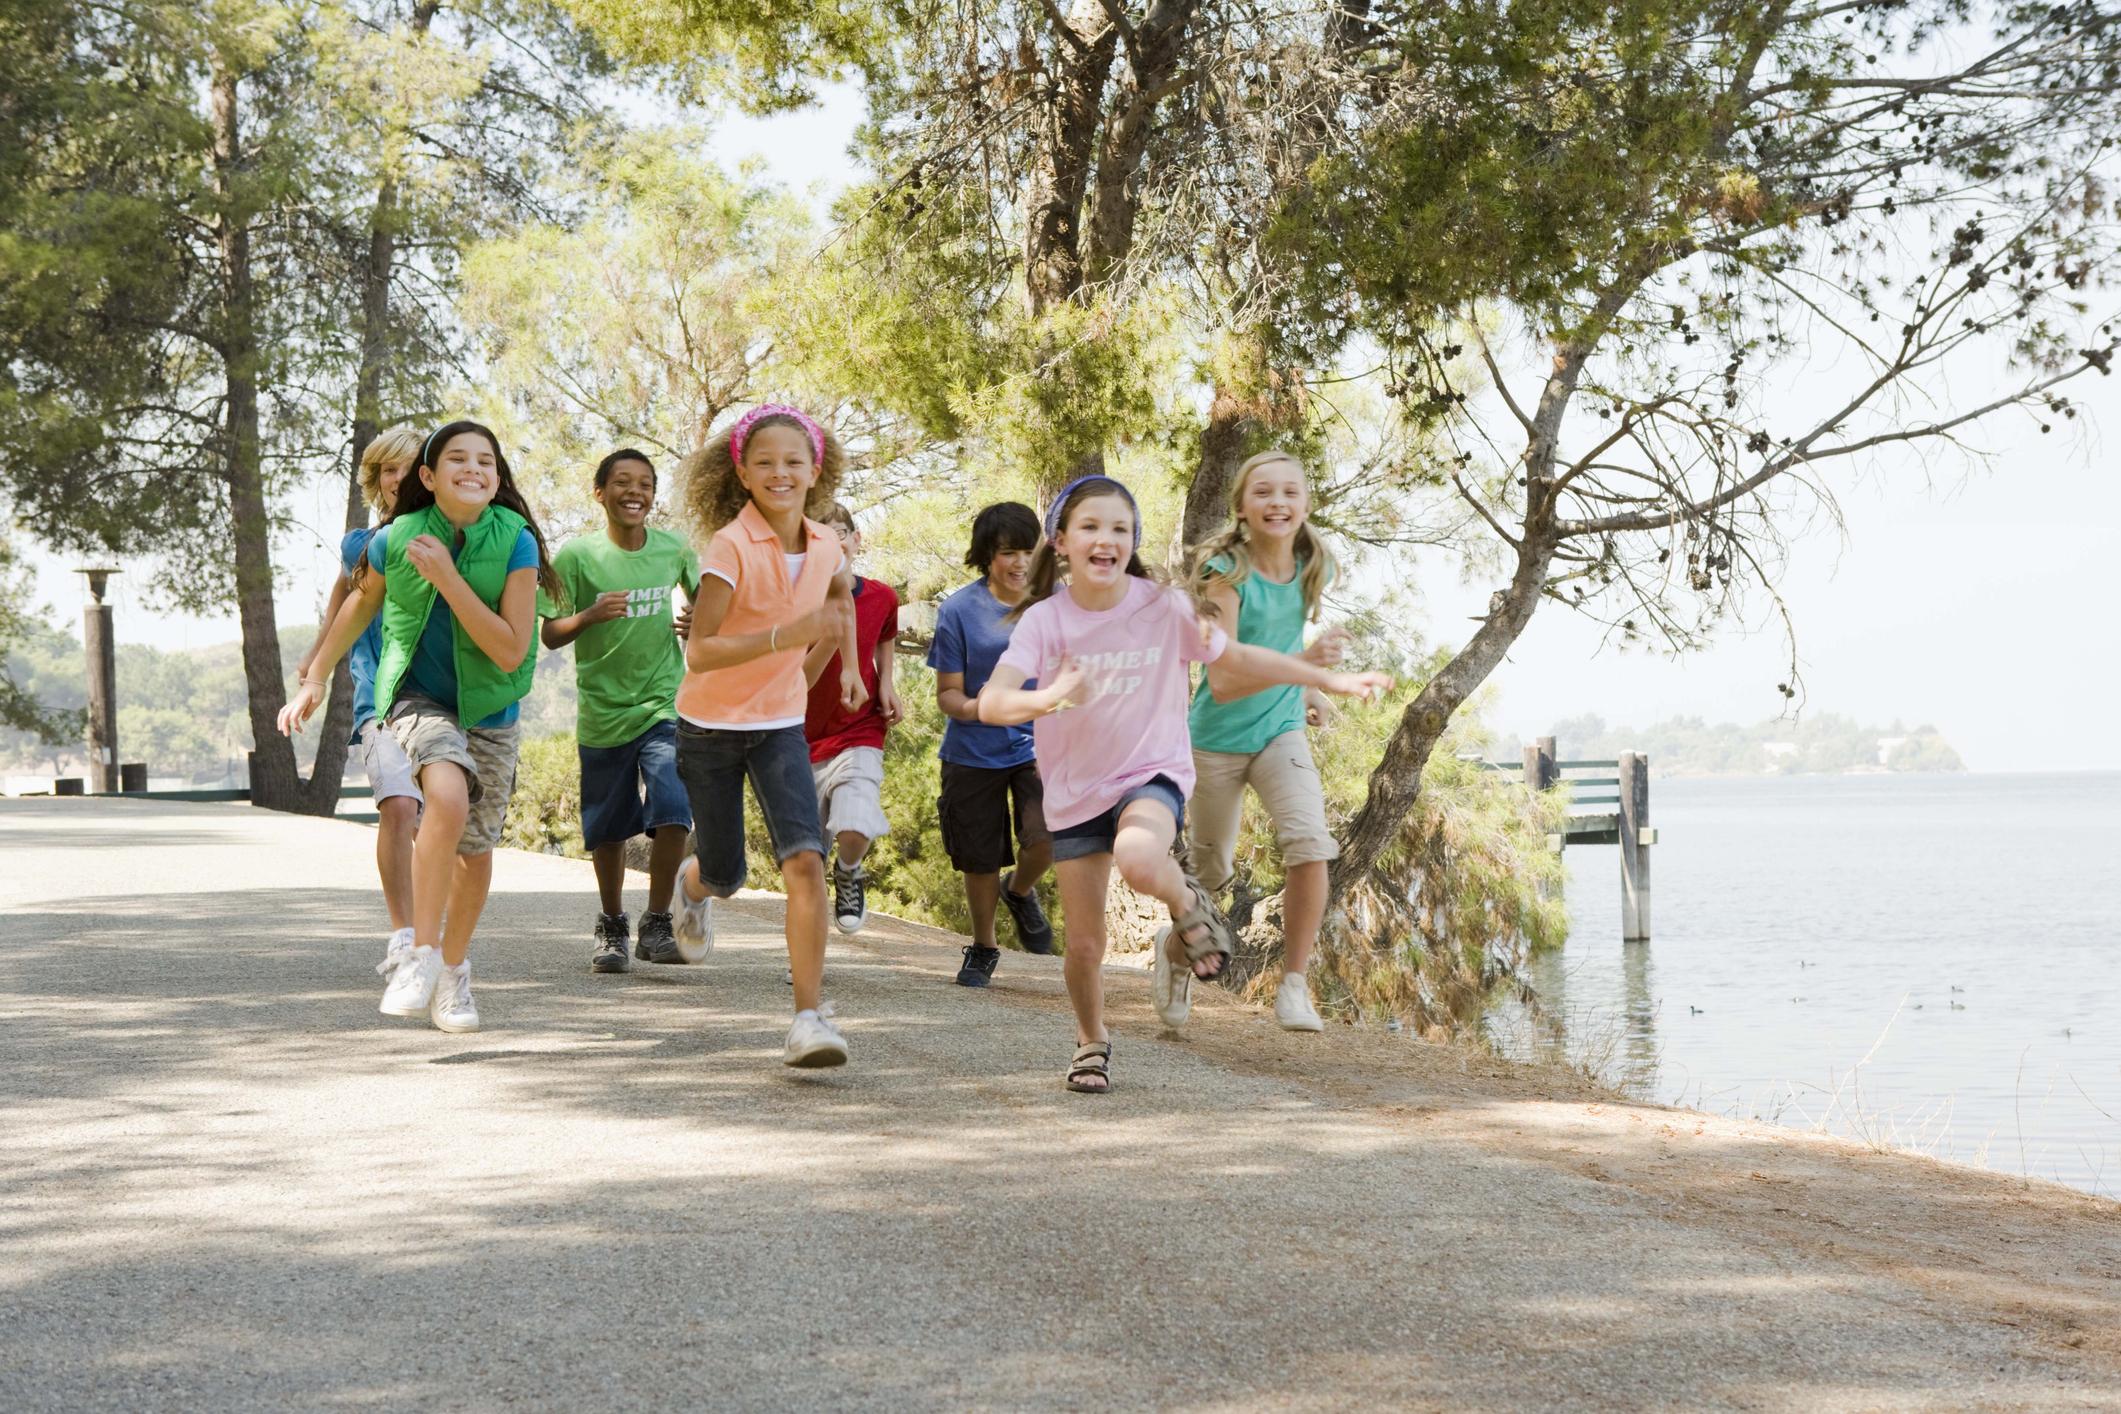 ThinkstockPhotos 86489821 Kako izabrati idealan sport za decu?